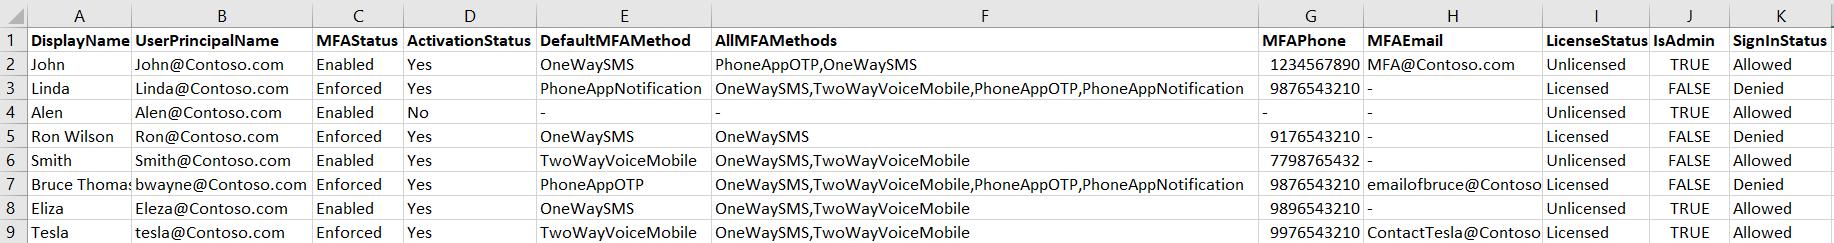 MFA enabled user list